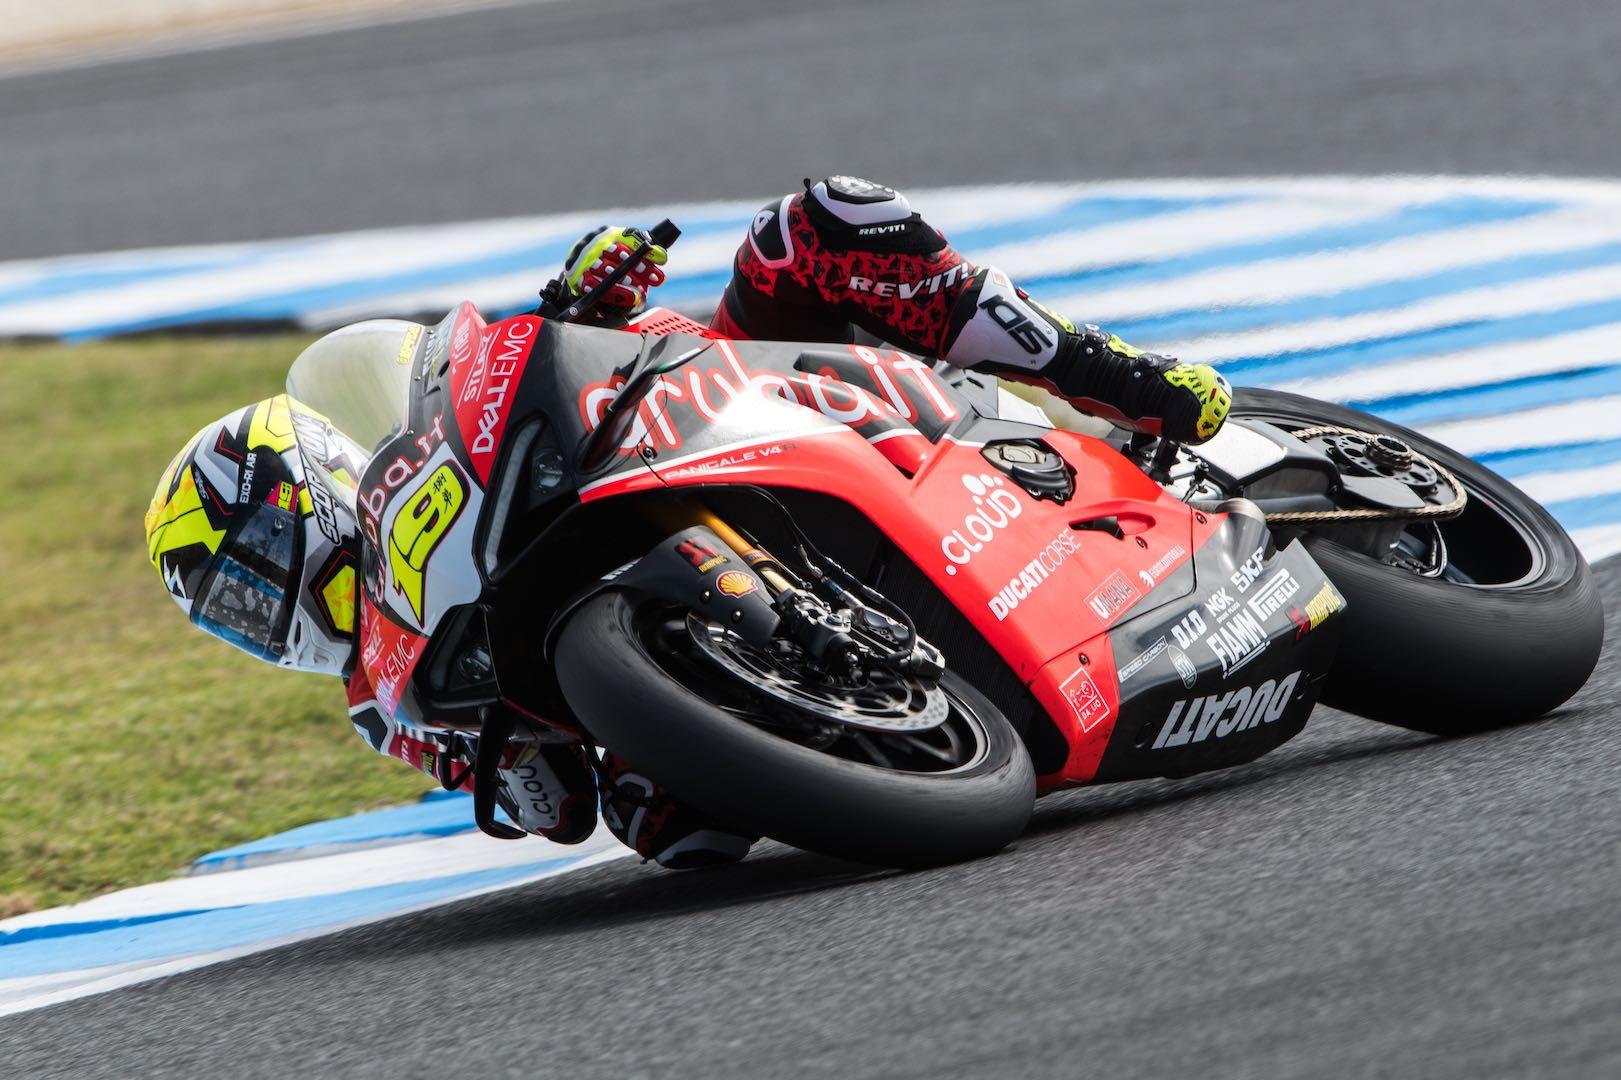 2019 Australia WorldSBK Test, Day 1: Ducati's Bautista Fastest by 0.4